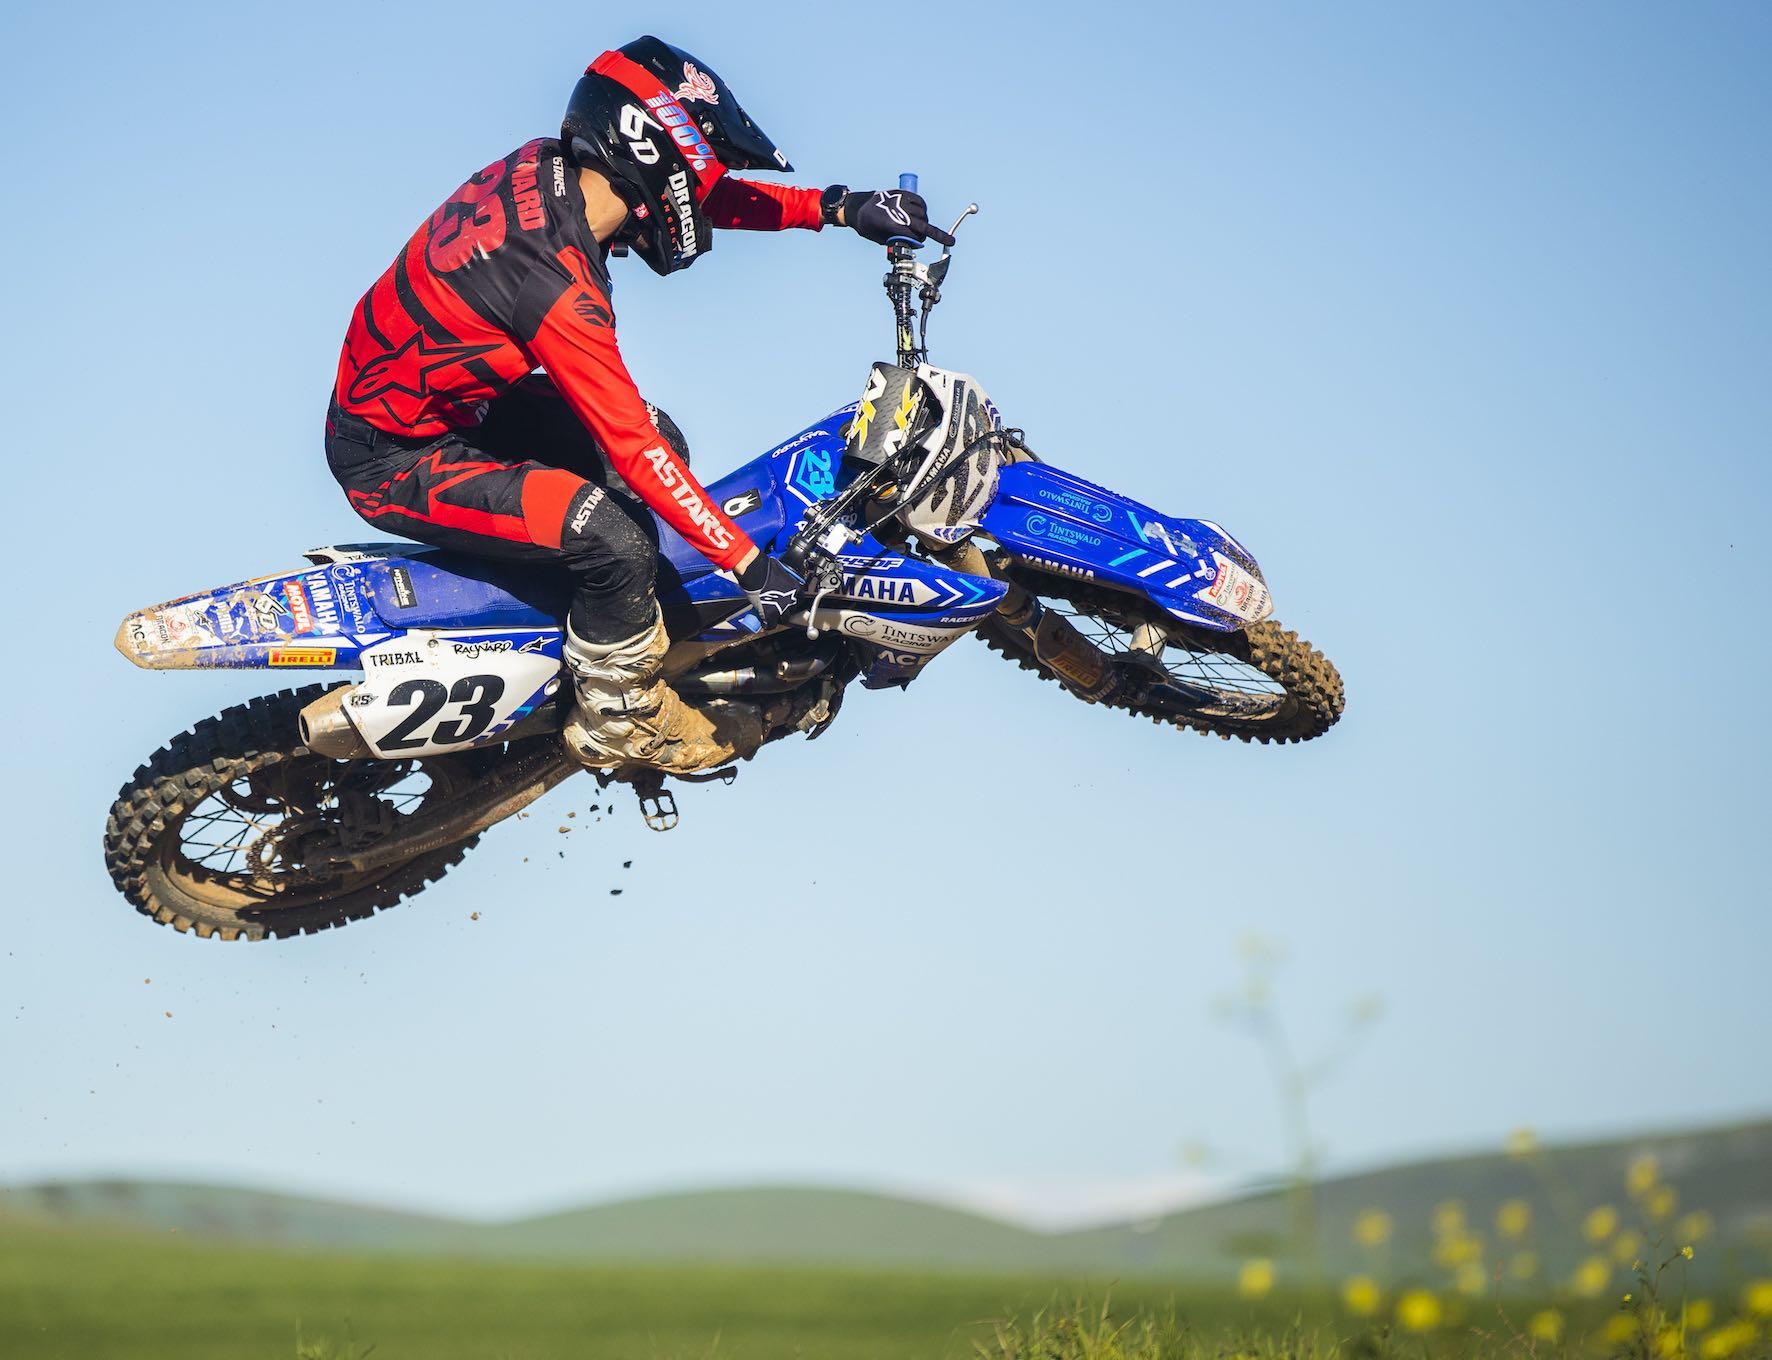 Anthony Raynard riding at Zone 7 motocross track